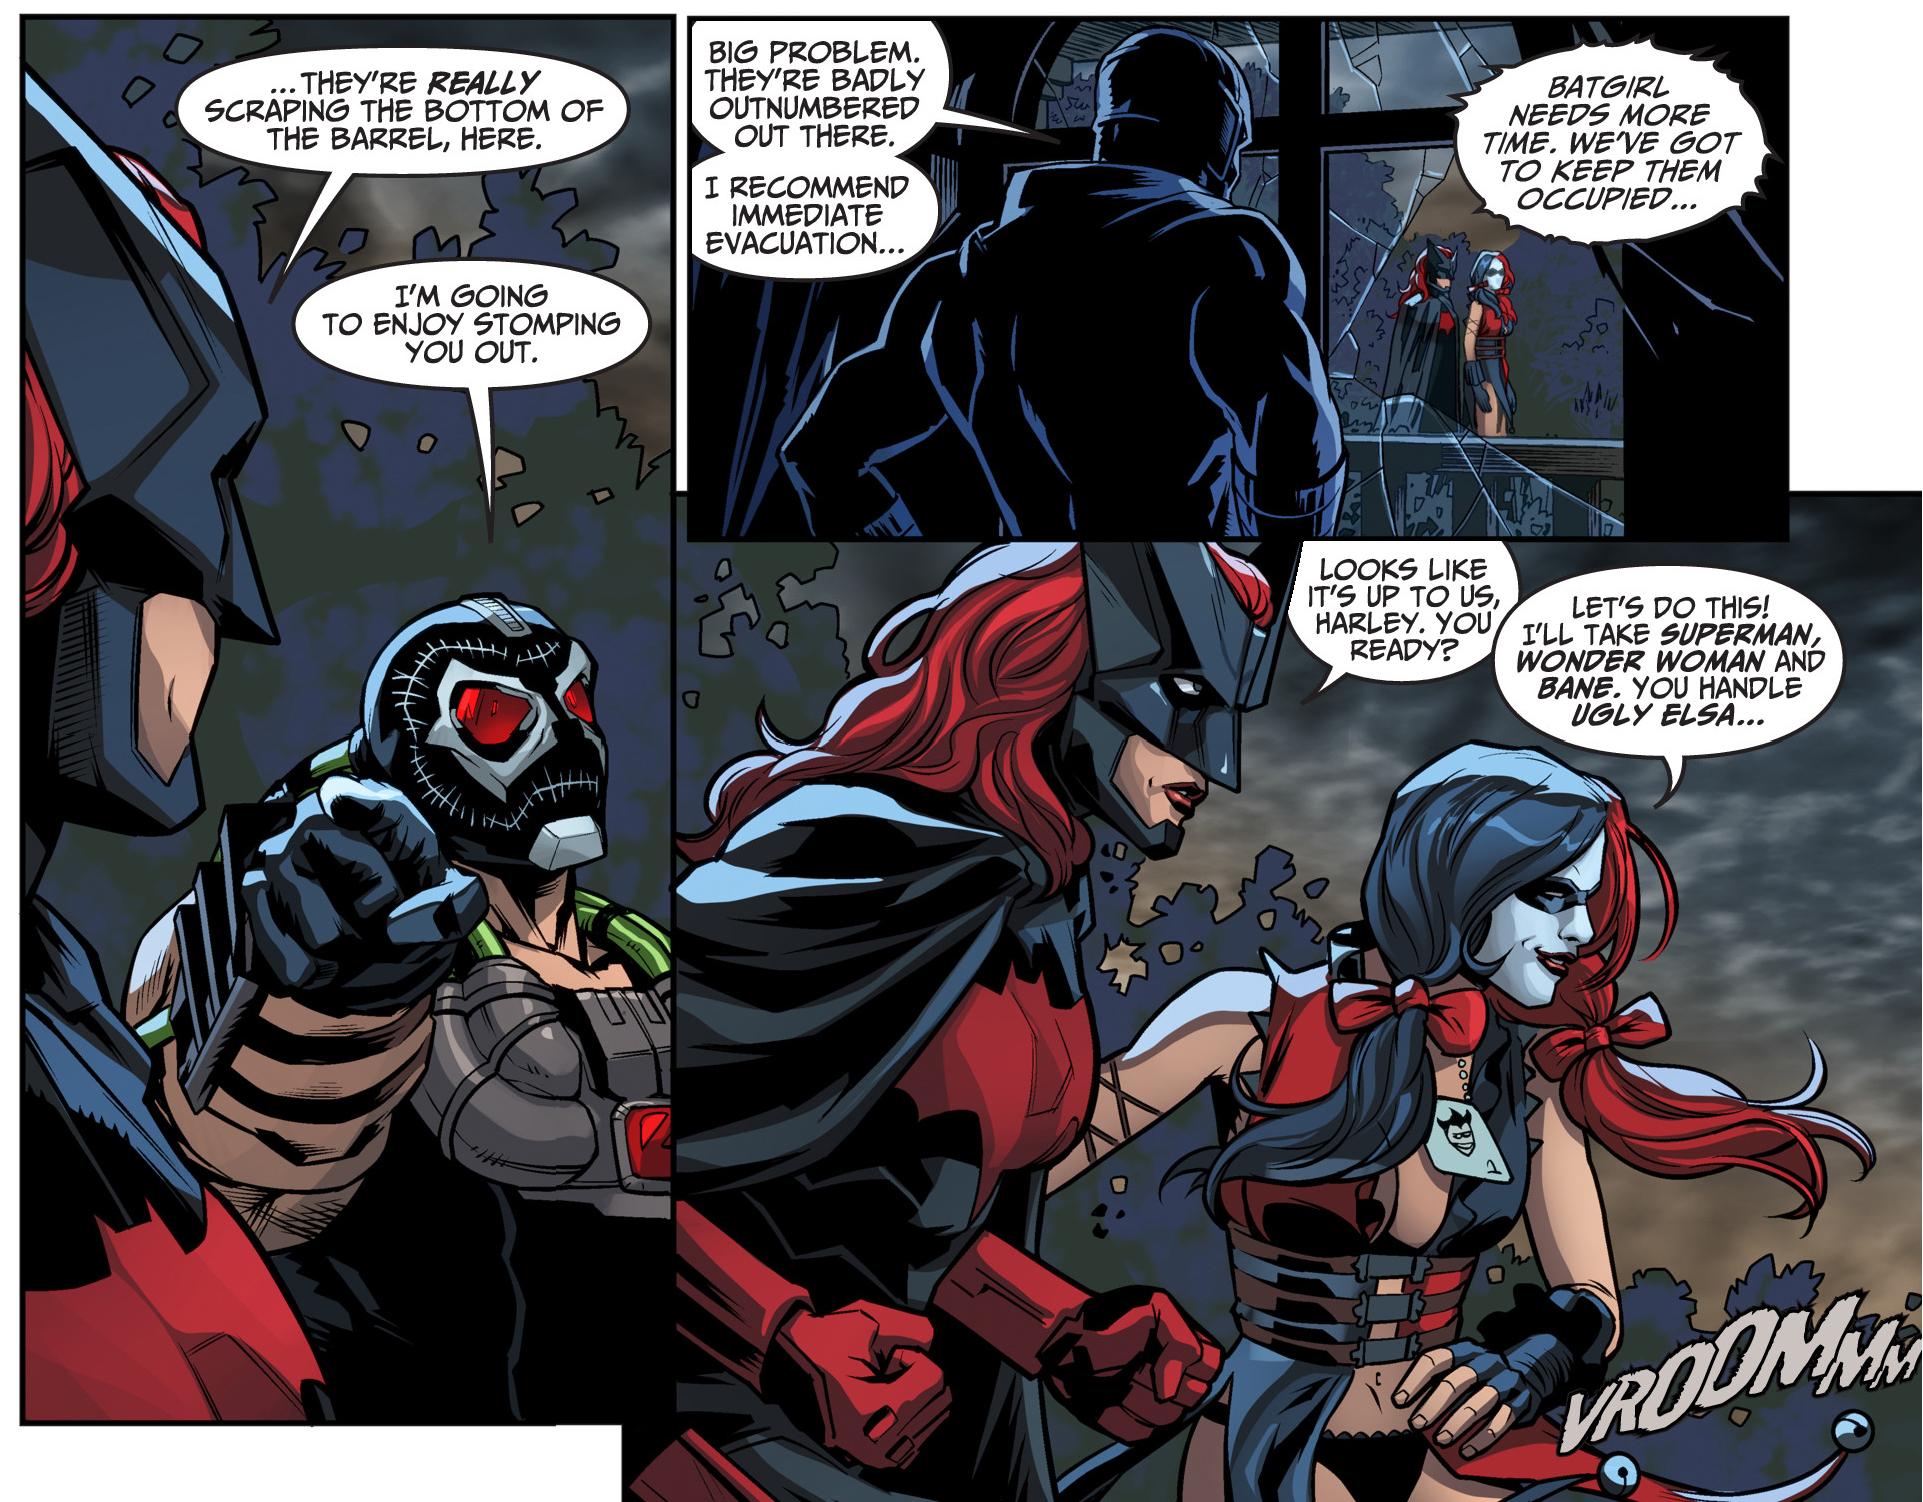 Batwoman And Harley Quinn Vs Bane And Killer Frost Vs -4049